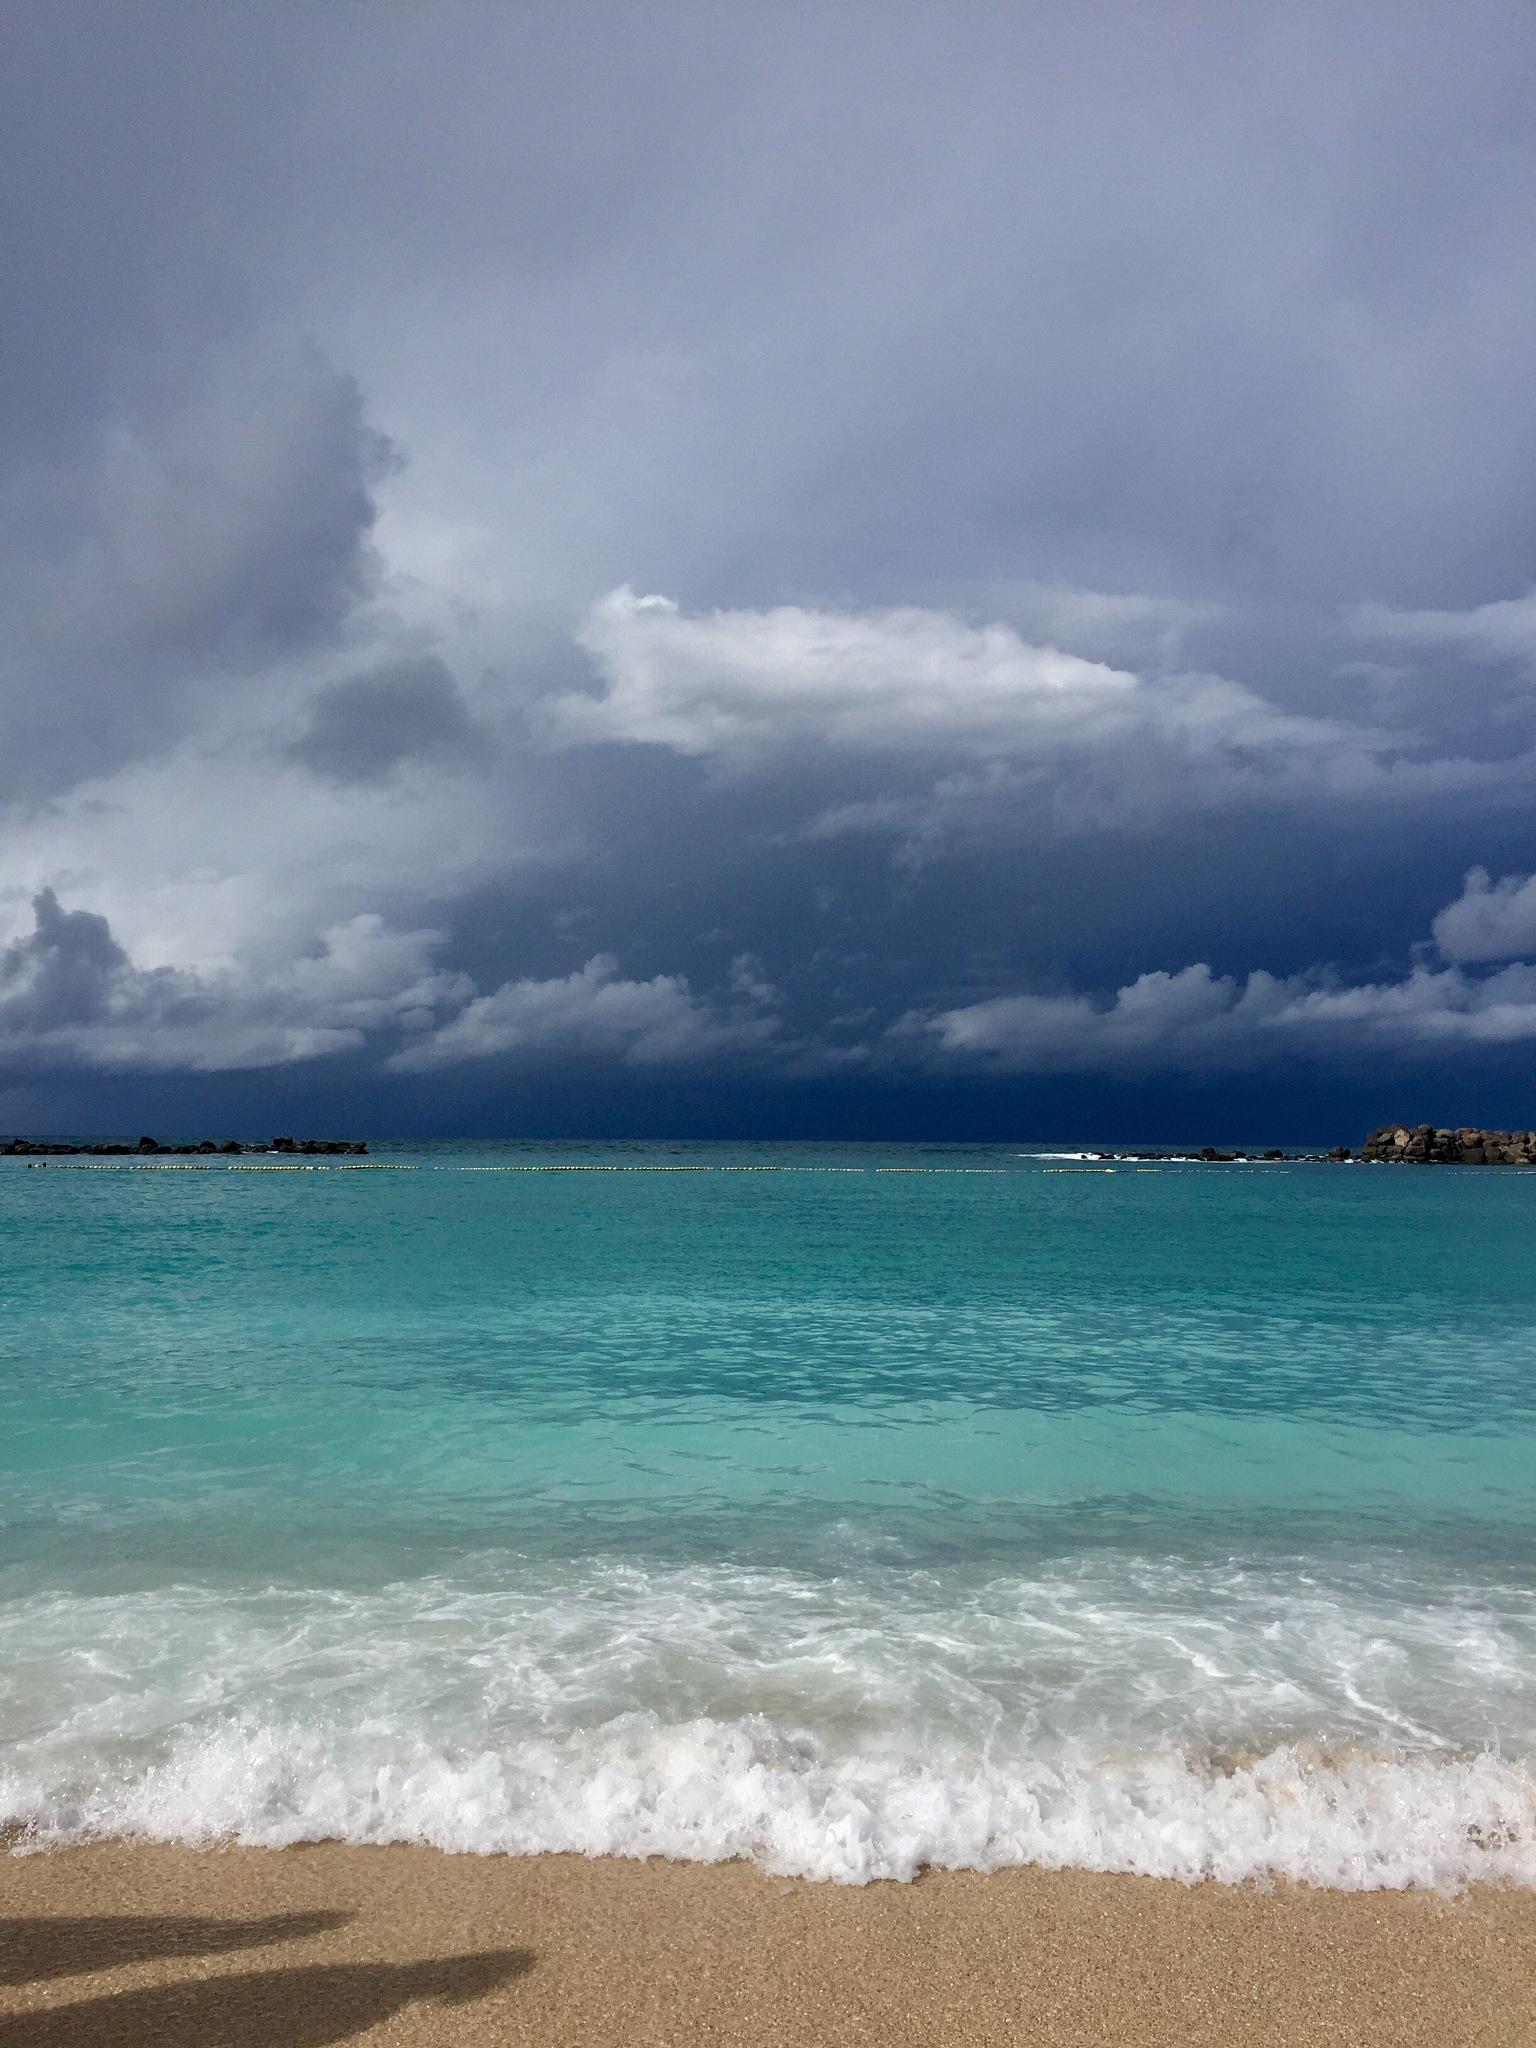 Before the rain at Amadores beach! by Cicki Jarneberg